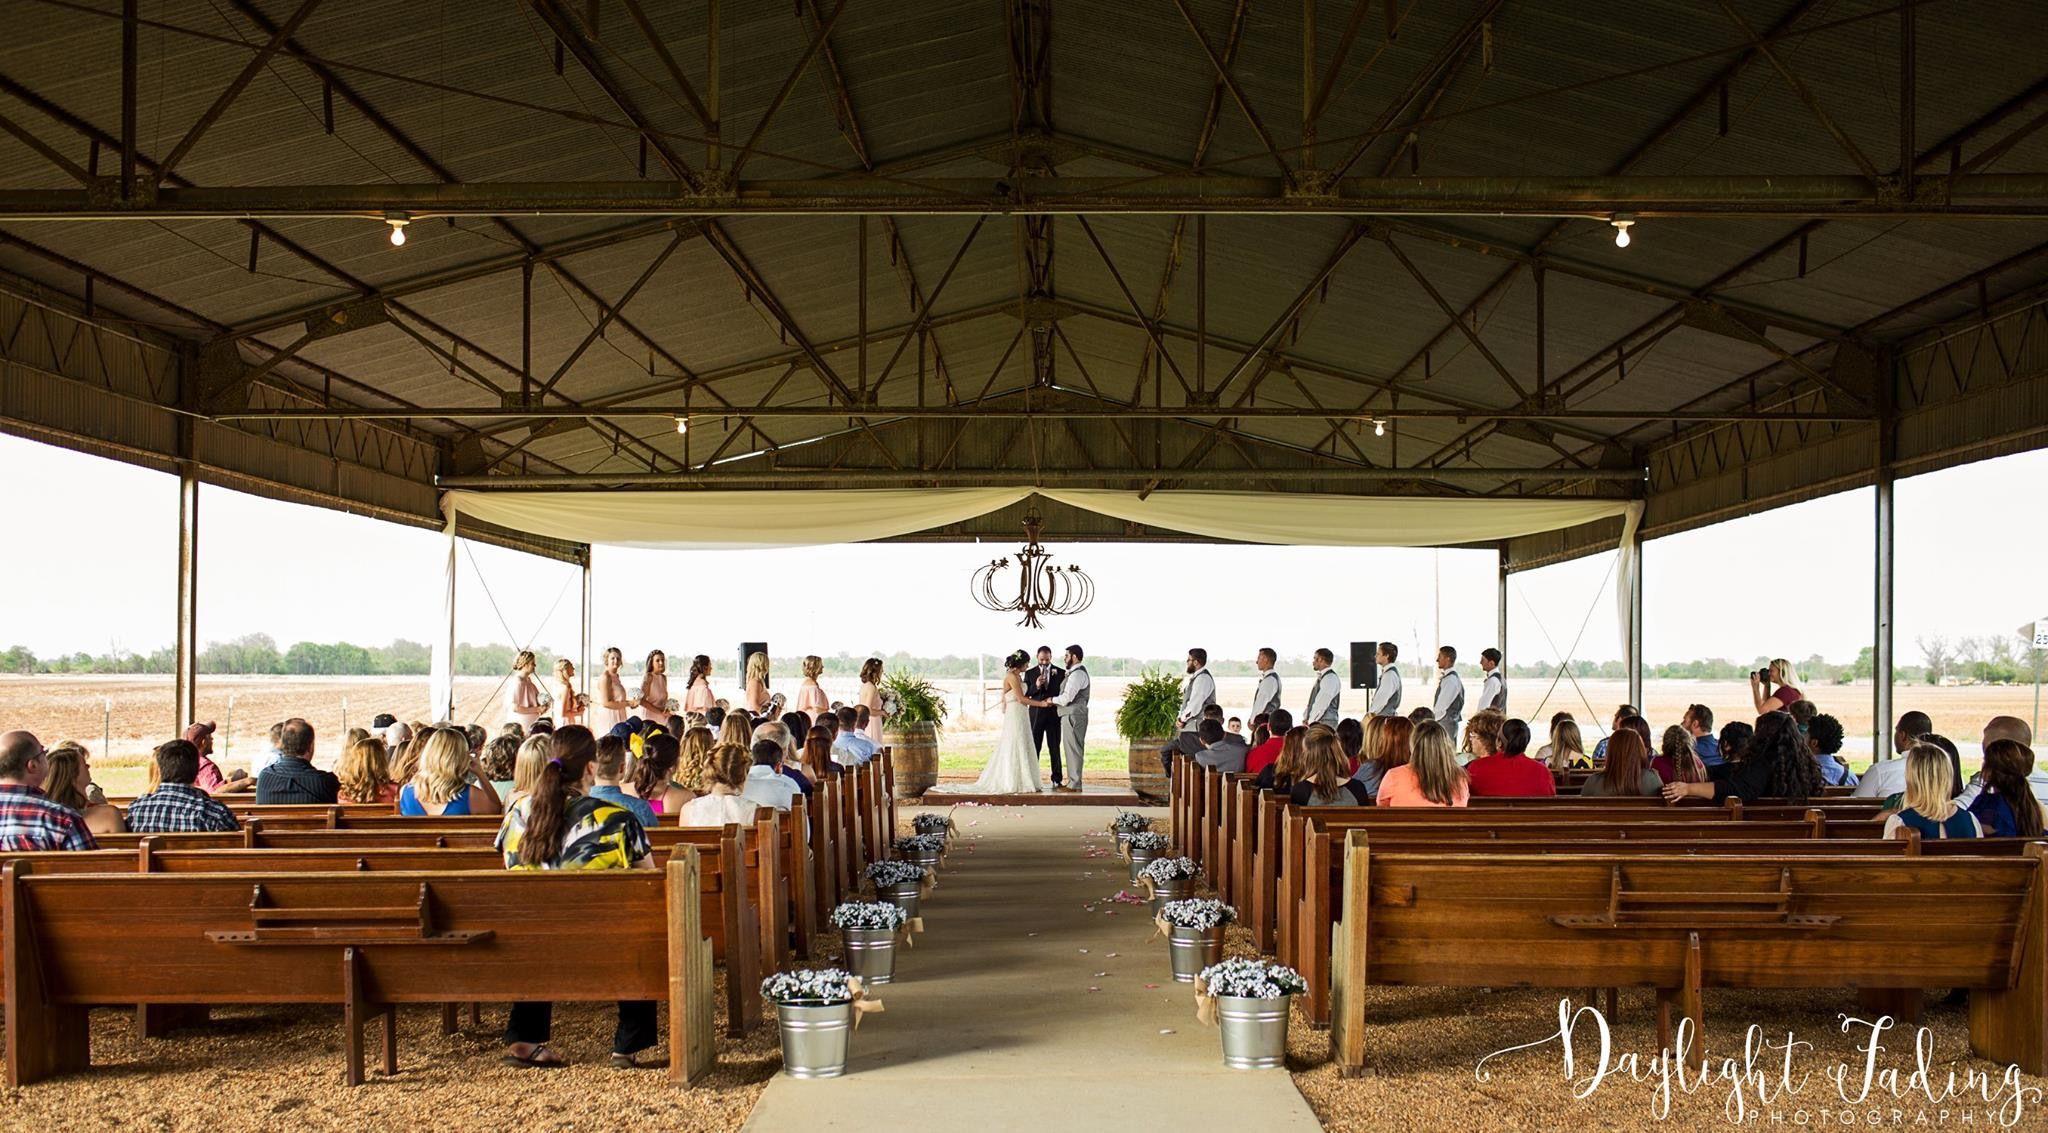 Wedding Ceremony At Dixie Gin In Shreveport Louisiana